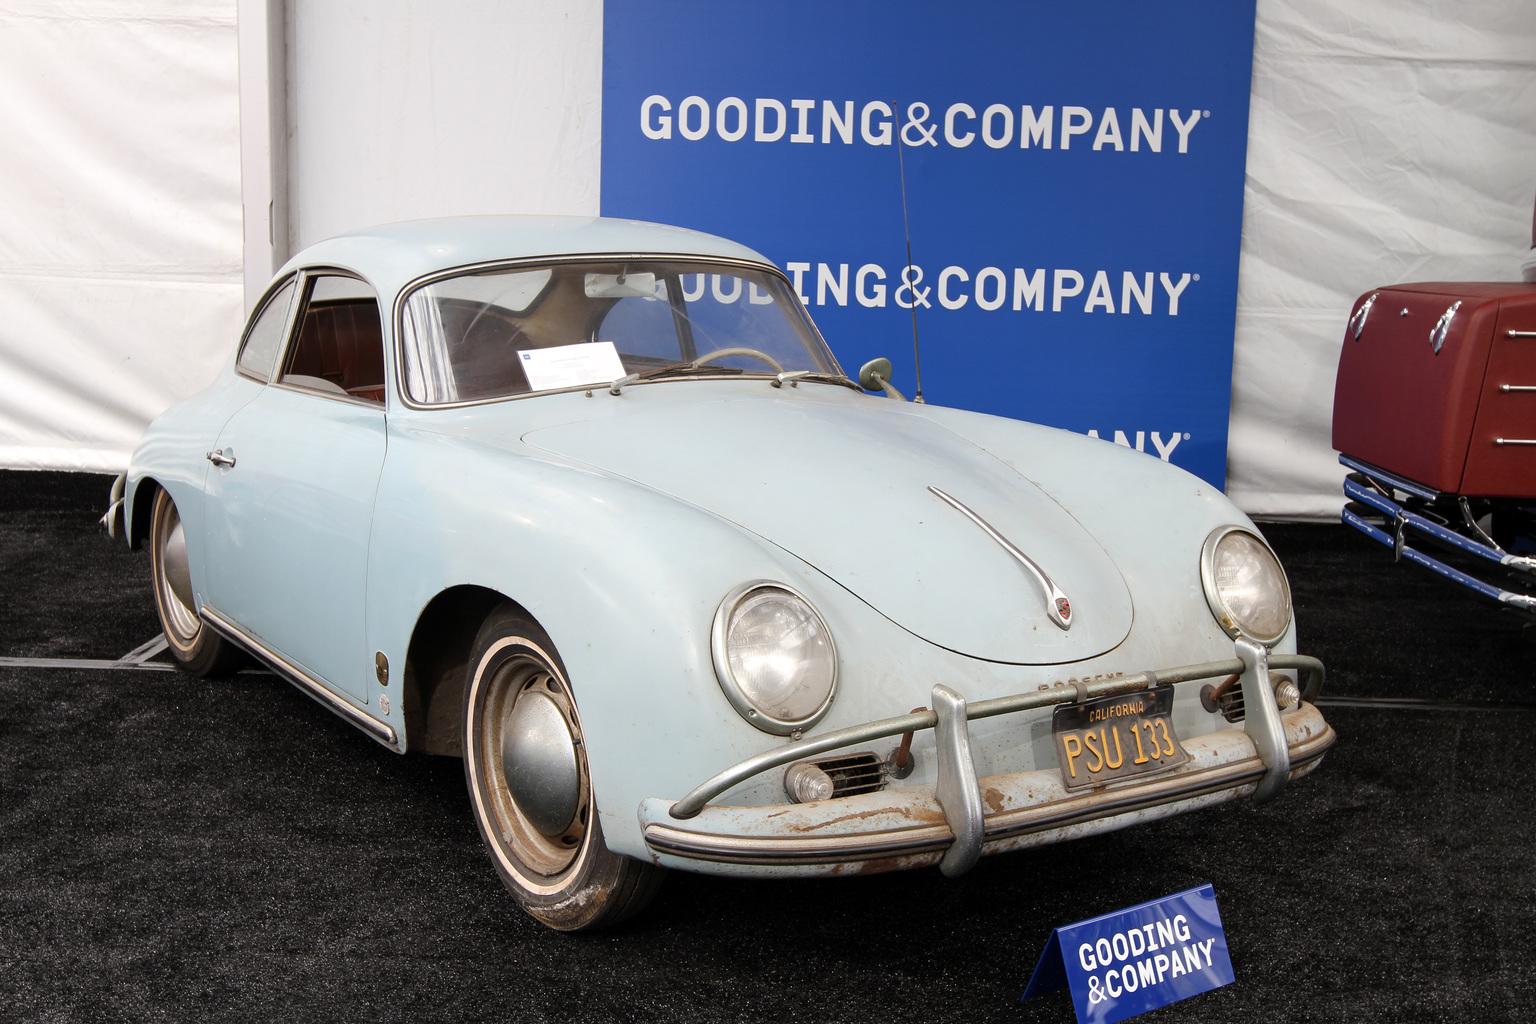 The 2015 Amelia Island Auction by Gooding & Company